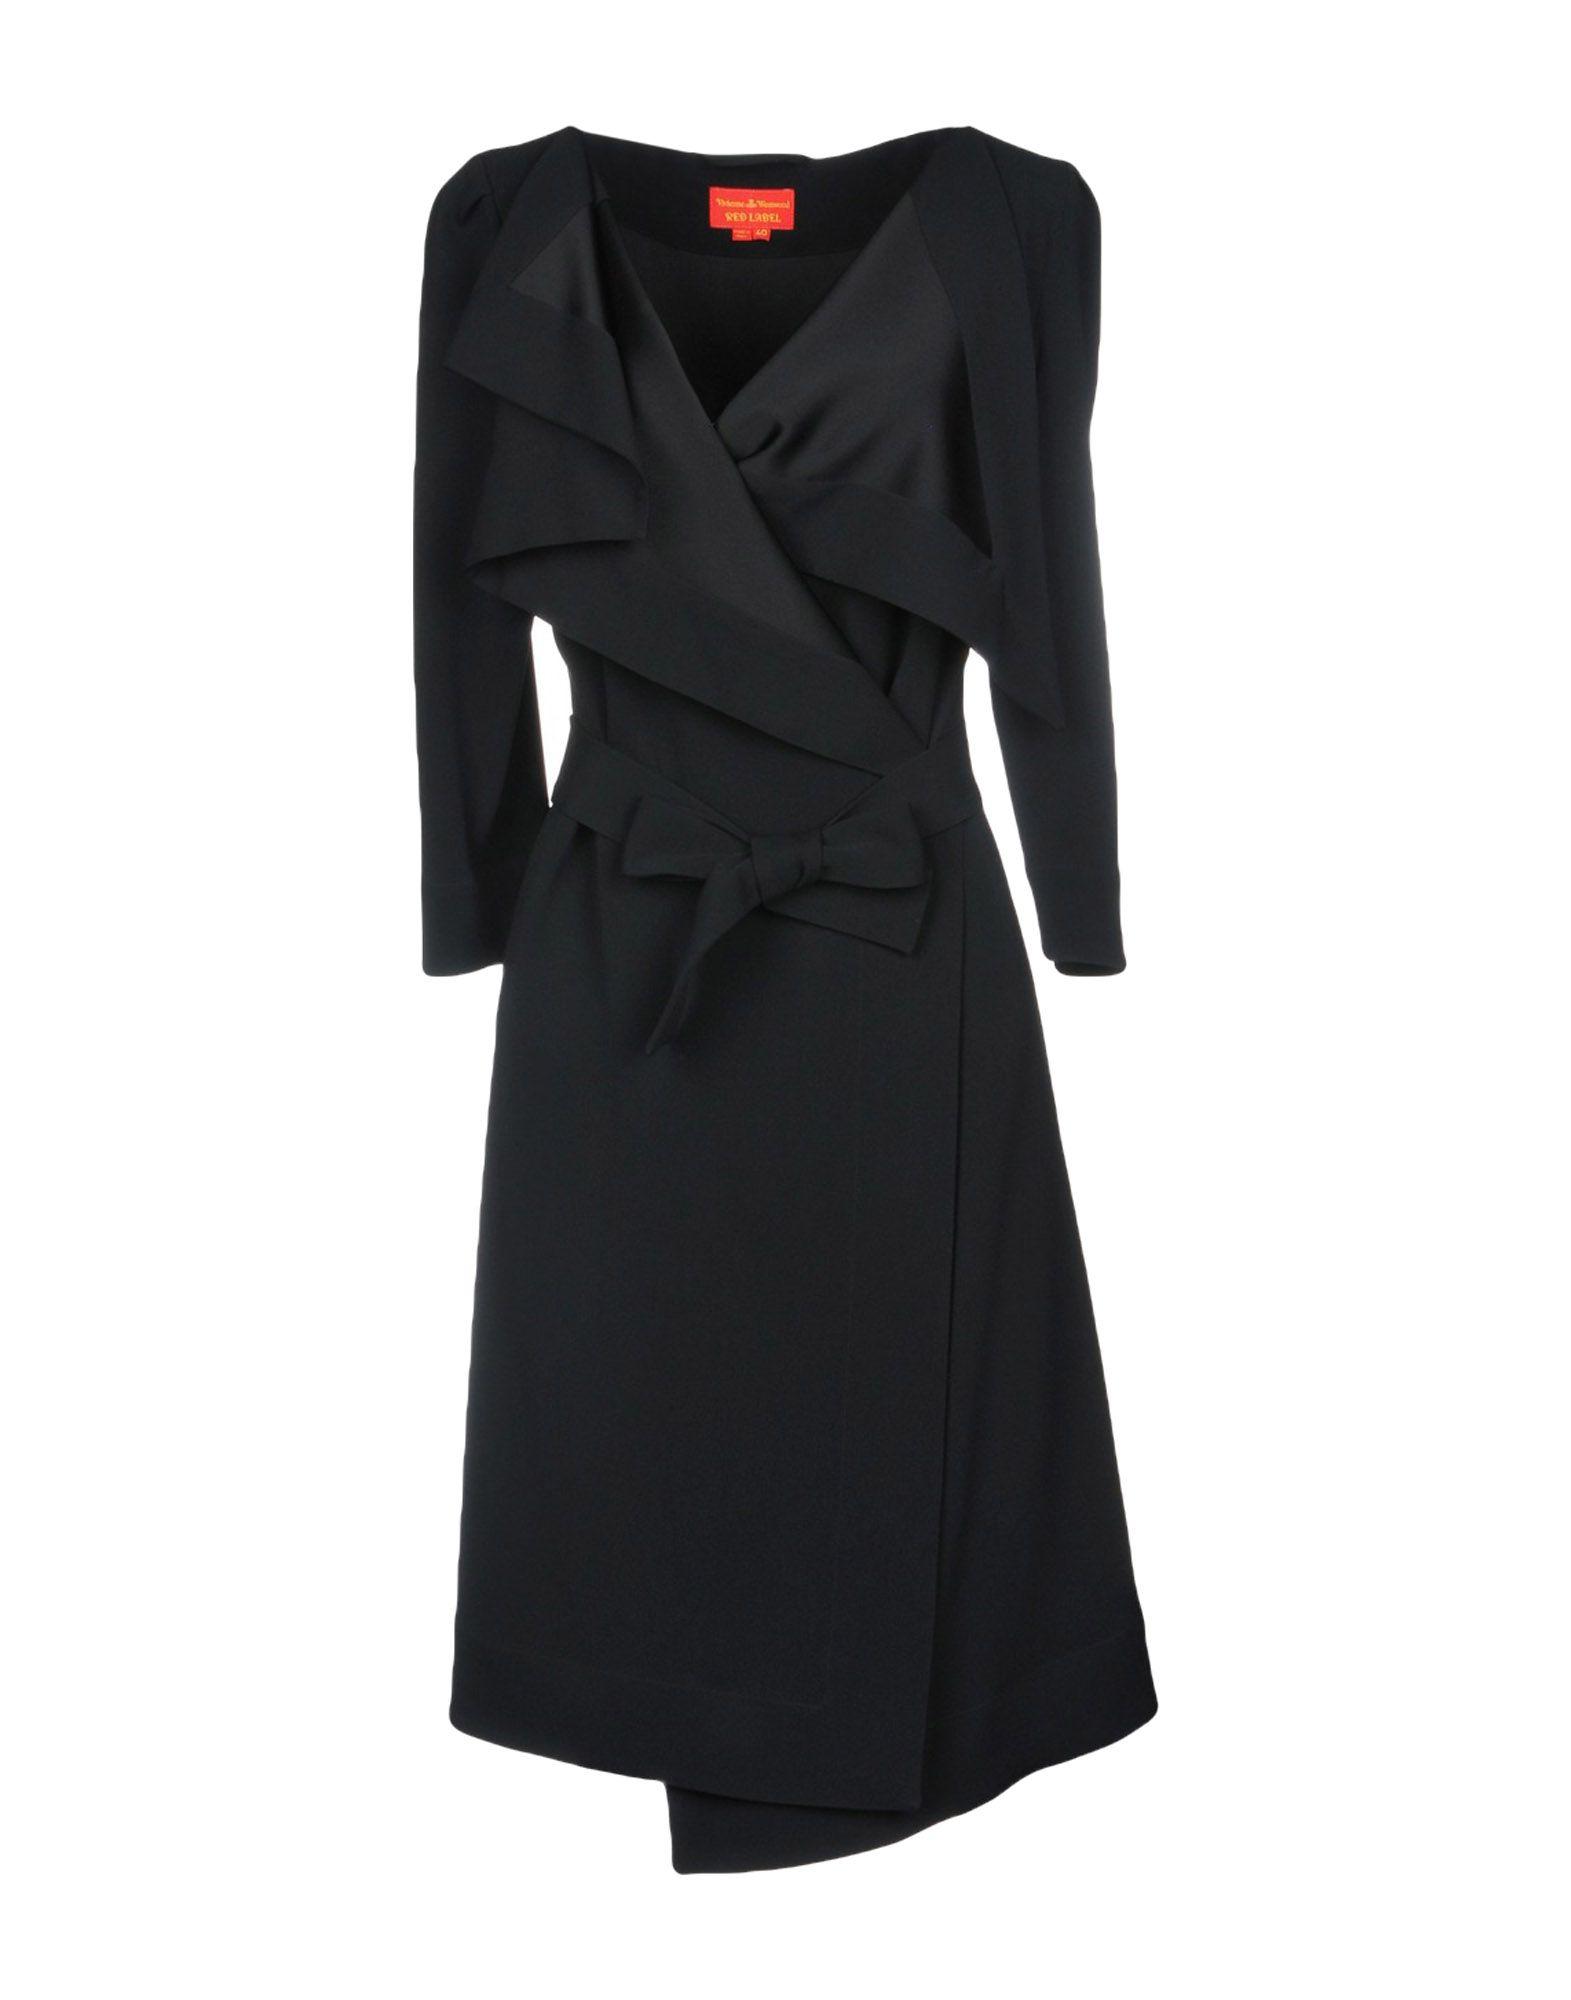 VIVIENNE WESTWOOD RED LABEL Платье до колена cv red label